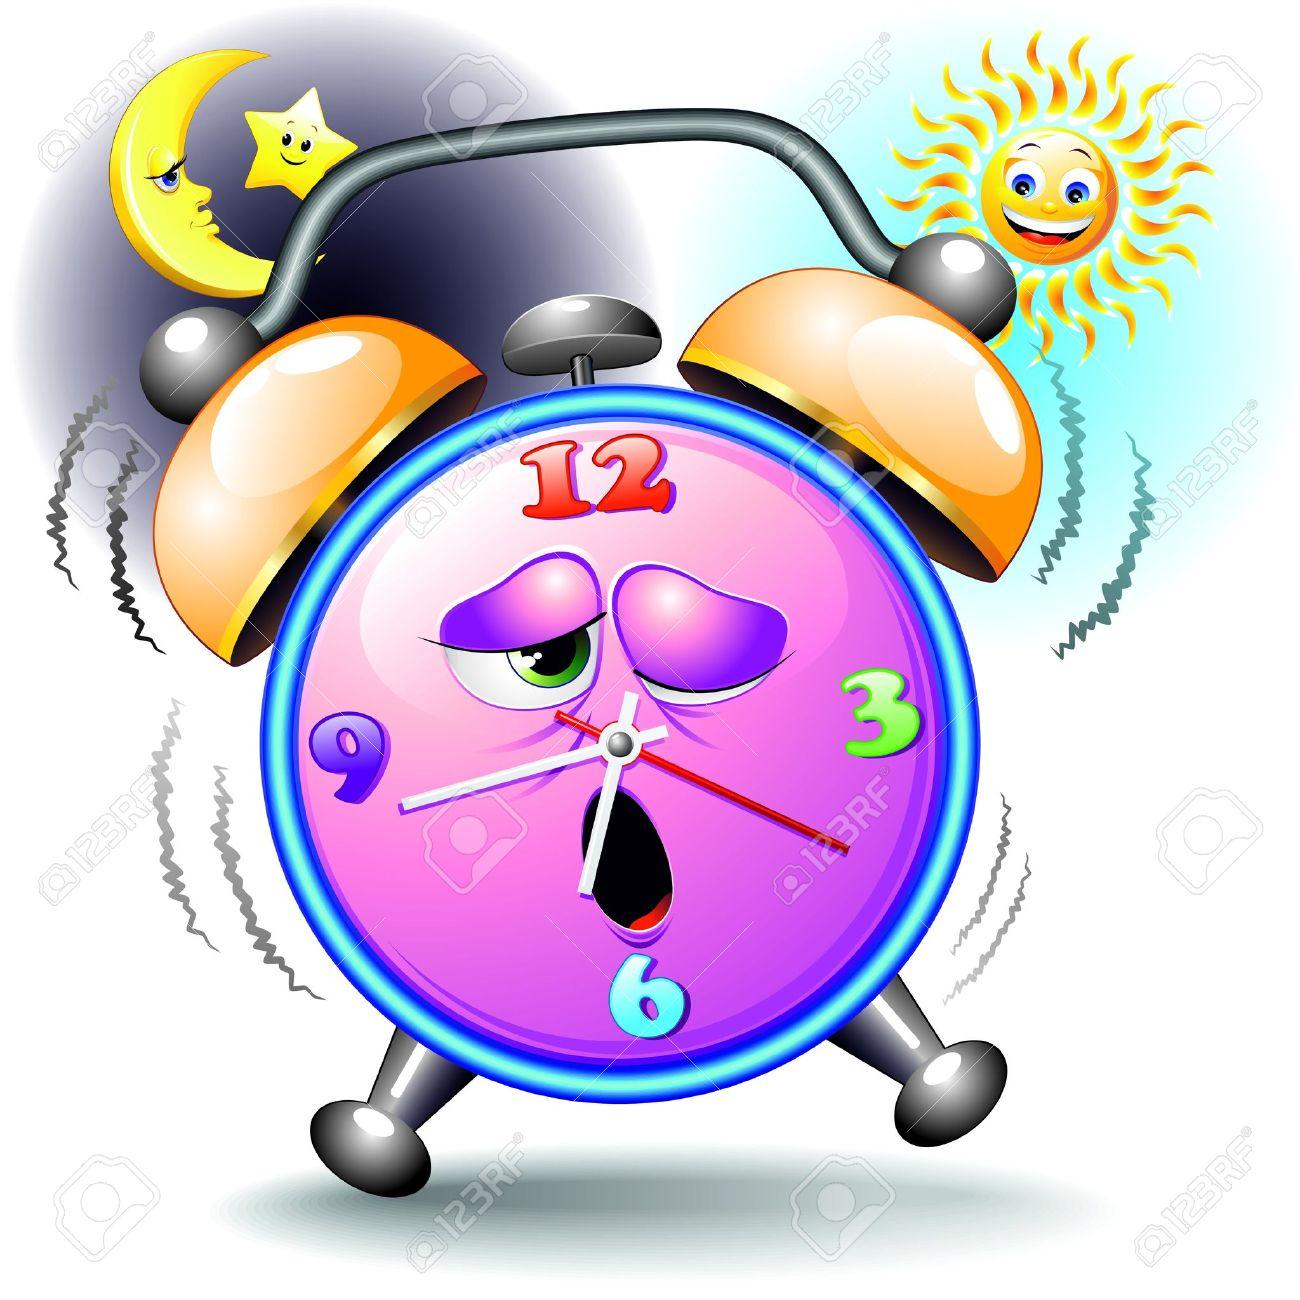 alarm clock funny cartoon day and night royalty free cliparts rh 123rf com